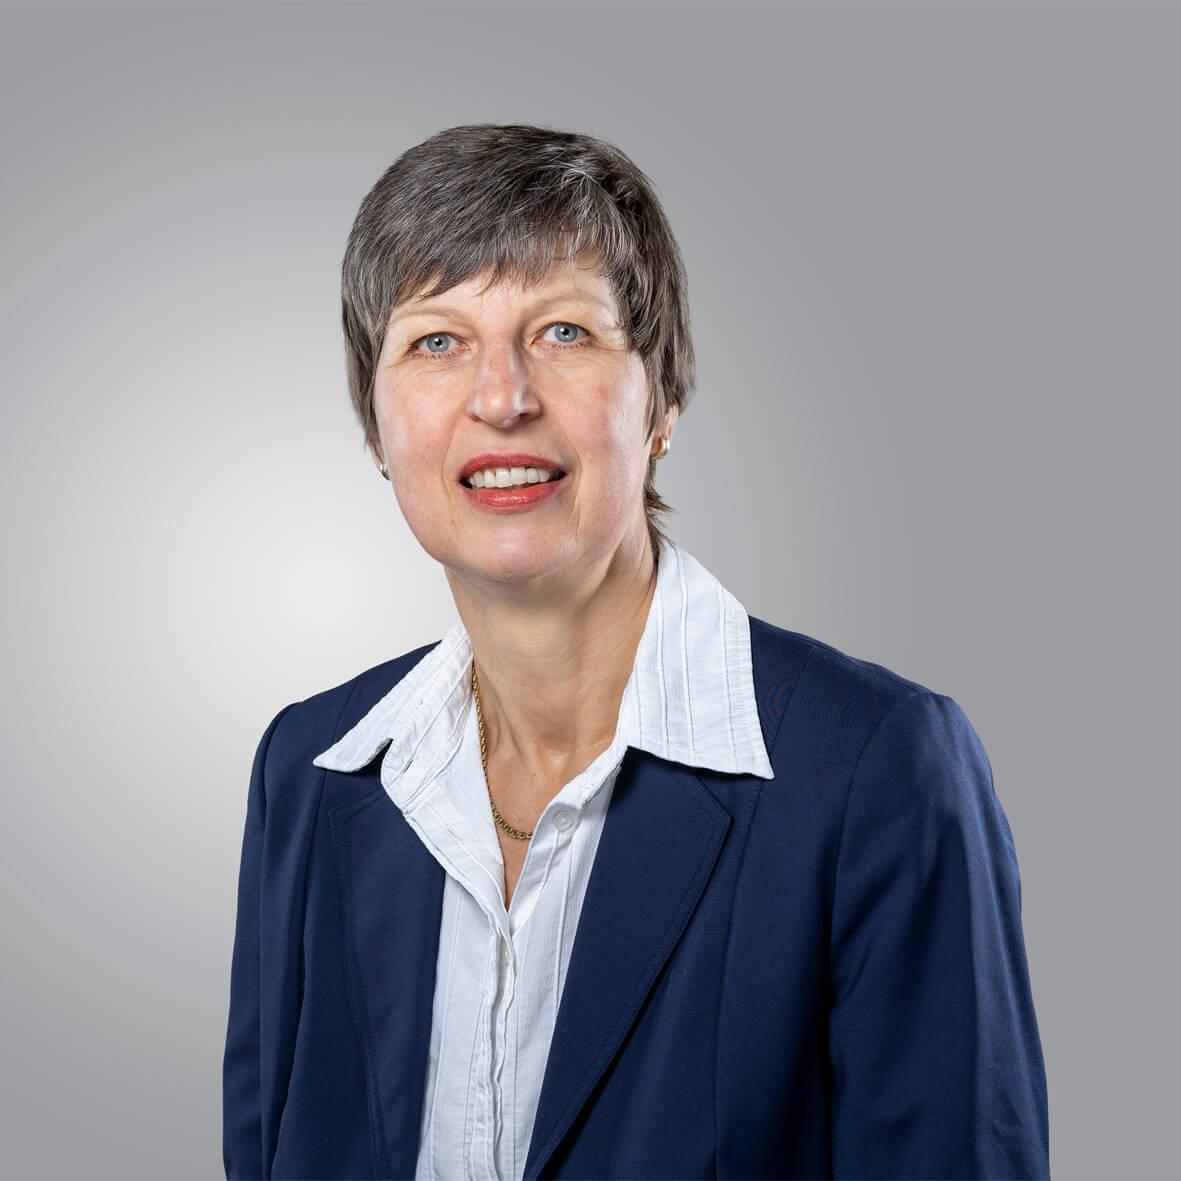 Sandra Pfundt